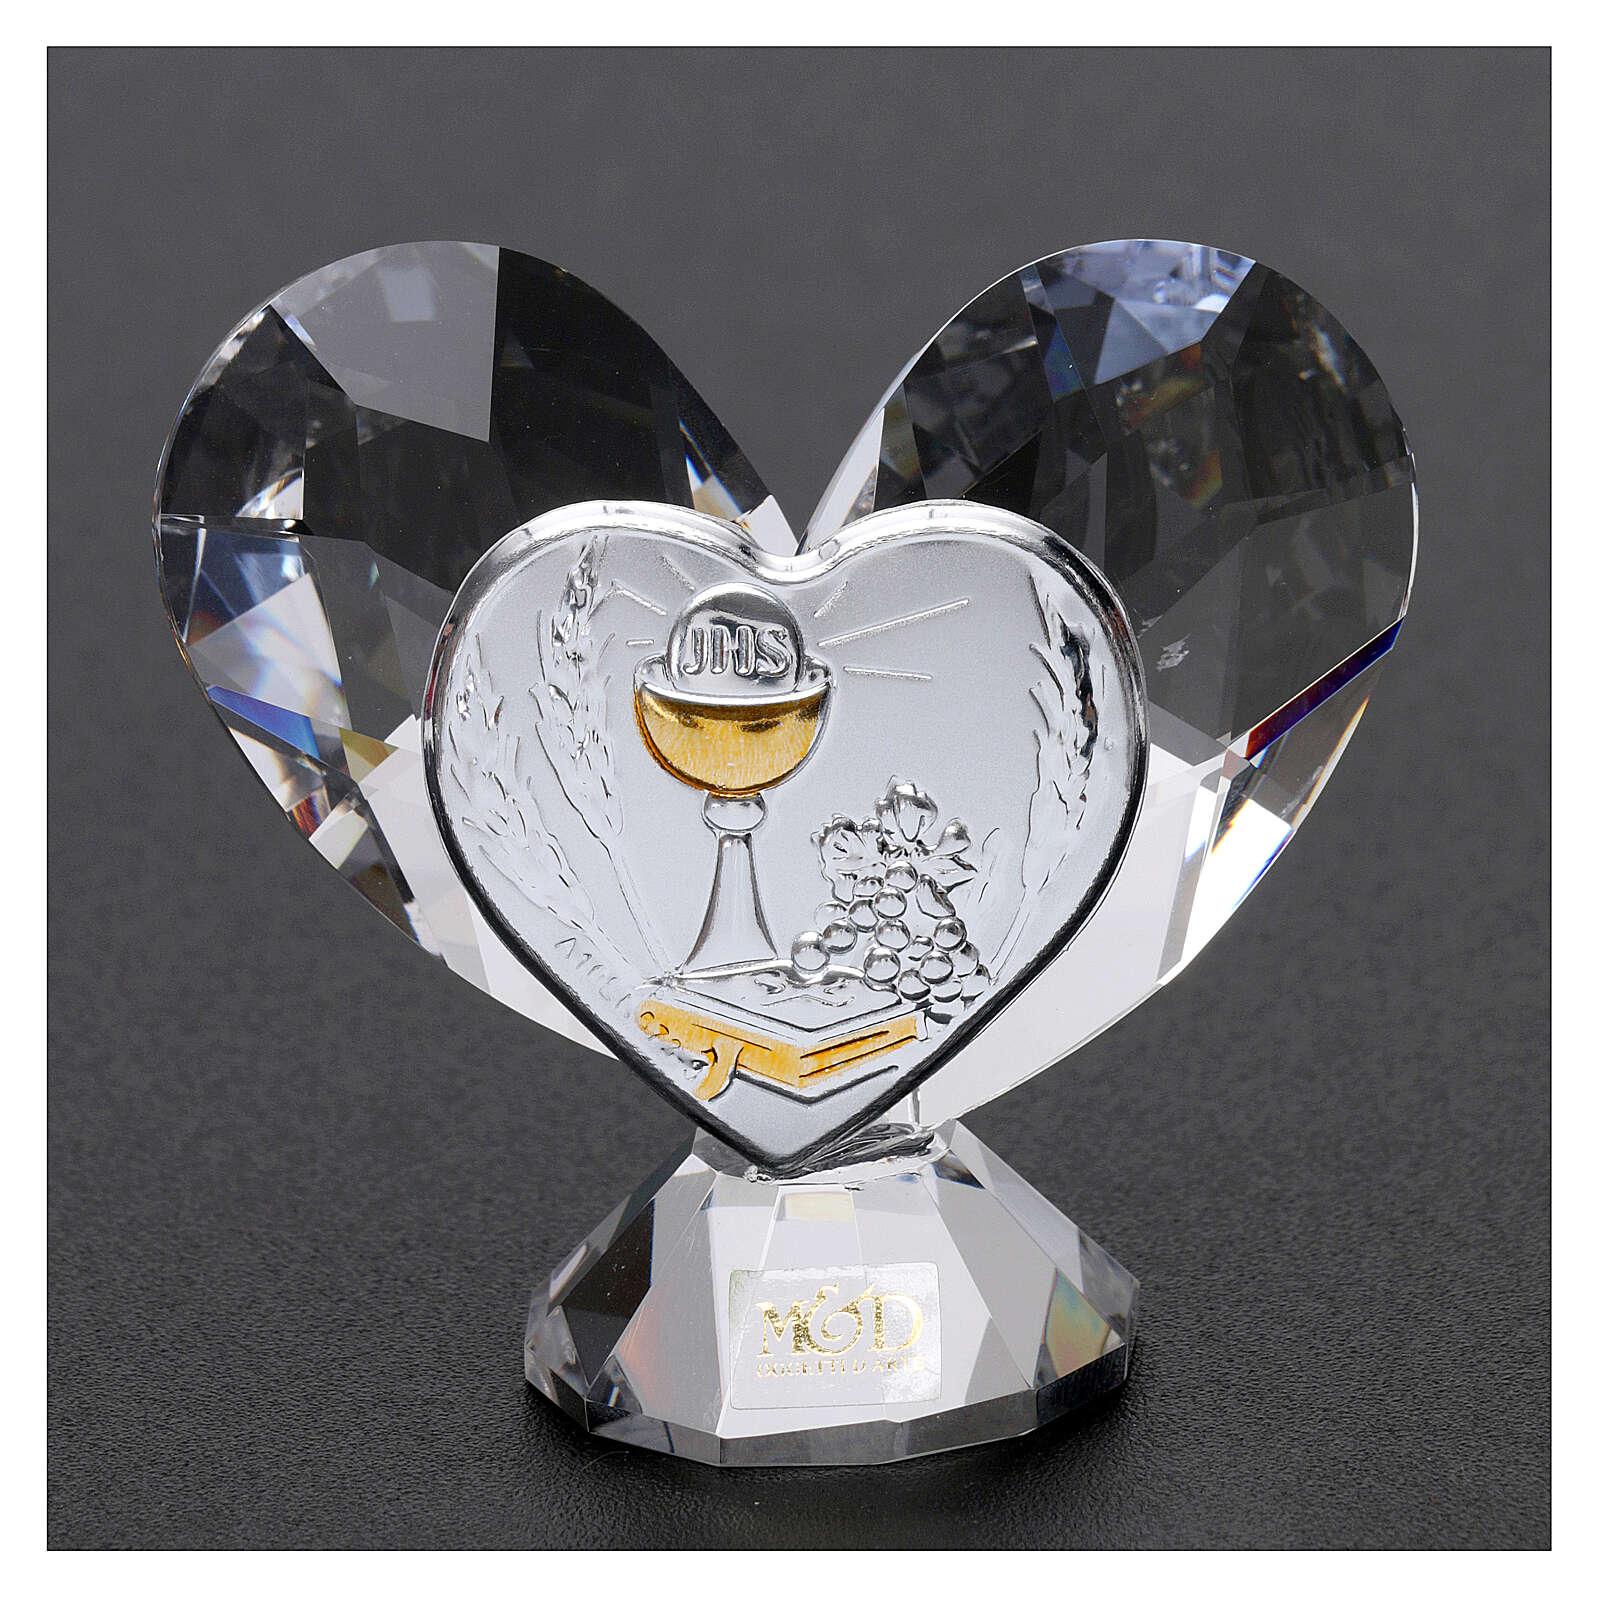 Heart shaped ornament Communion souvenir 2.2x2.4 in 3